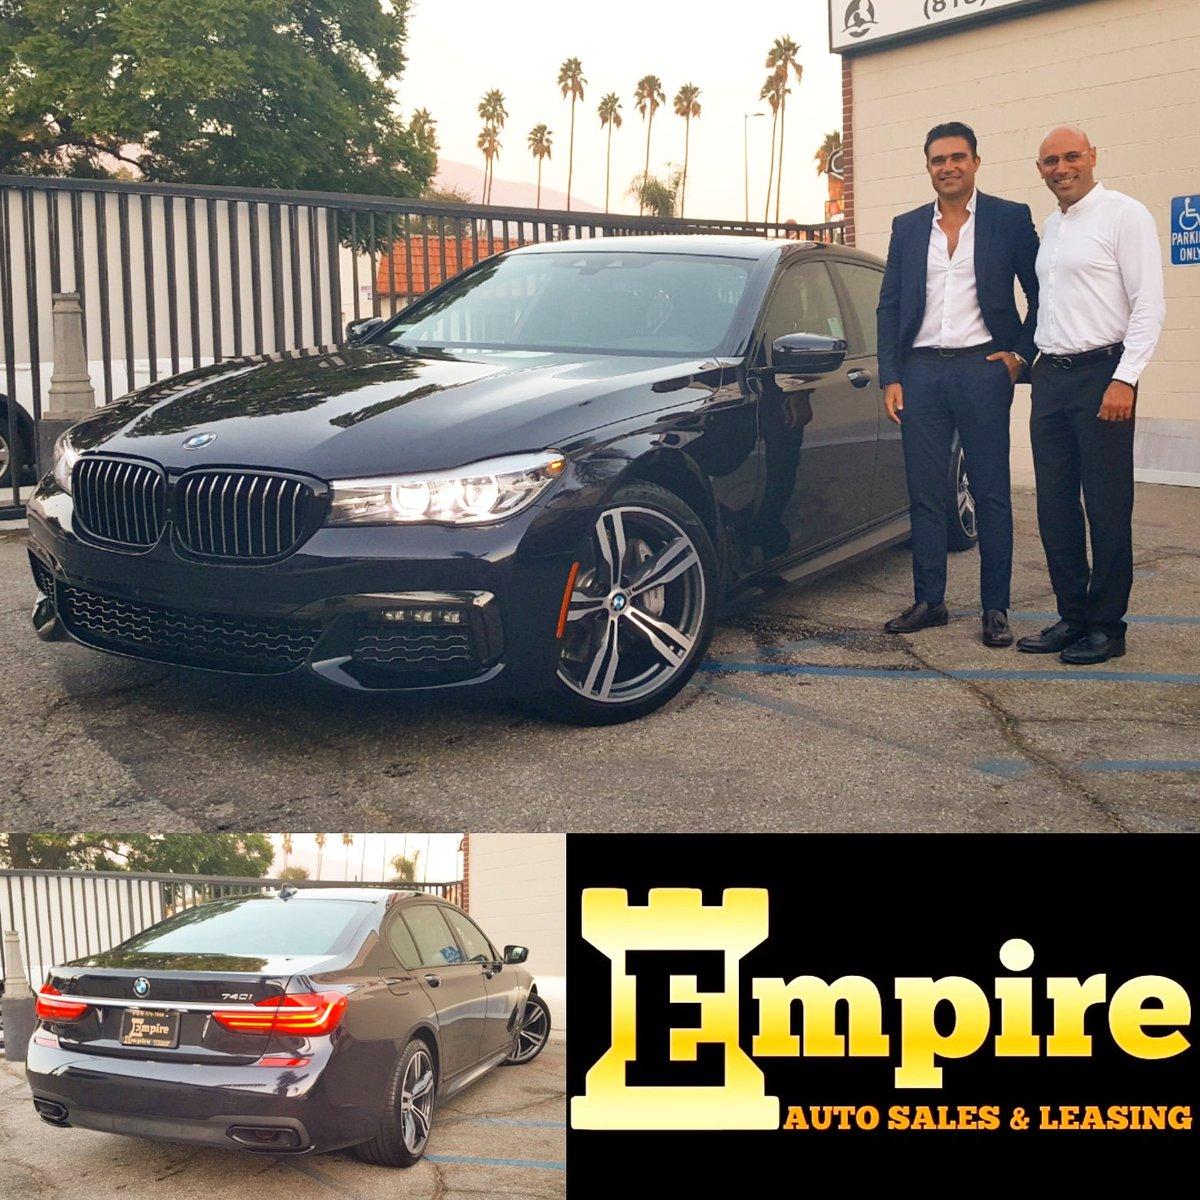 Empire Auto Sales >> Empire Auto Sales On Twitter 2019 Bmw 740i Darkblue Black